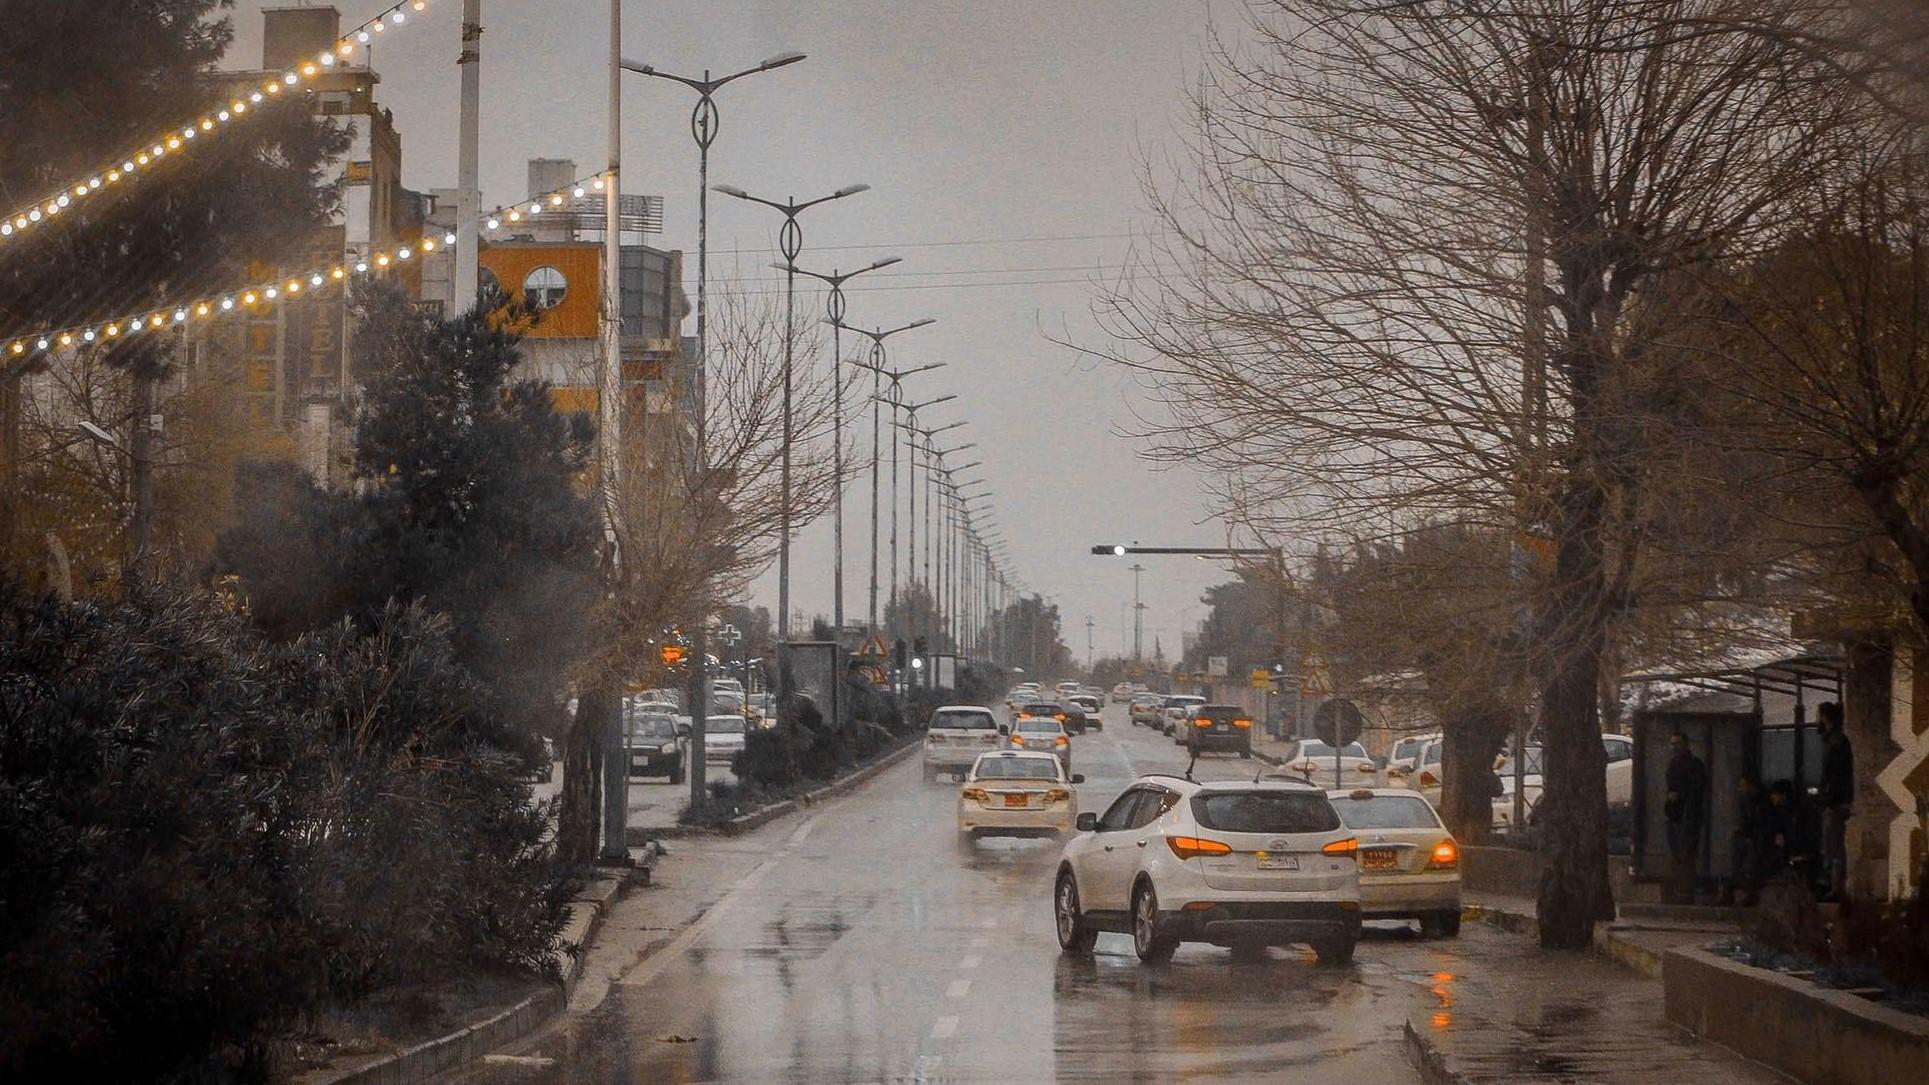 Sulaymaniyah suspend schools for 28 days